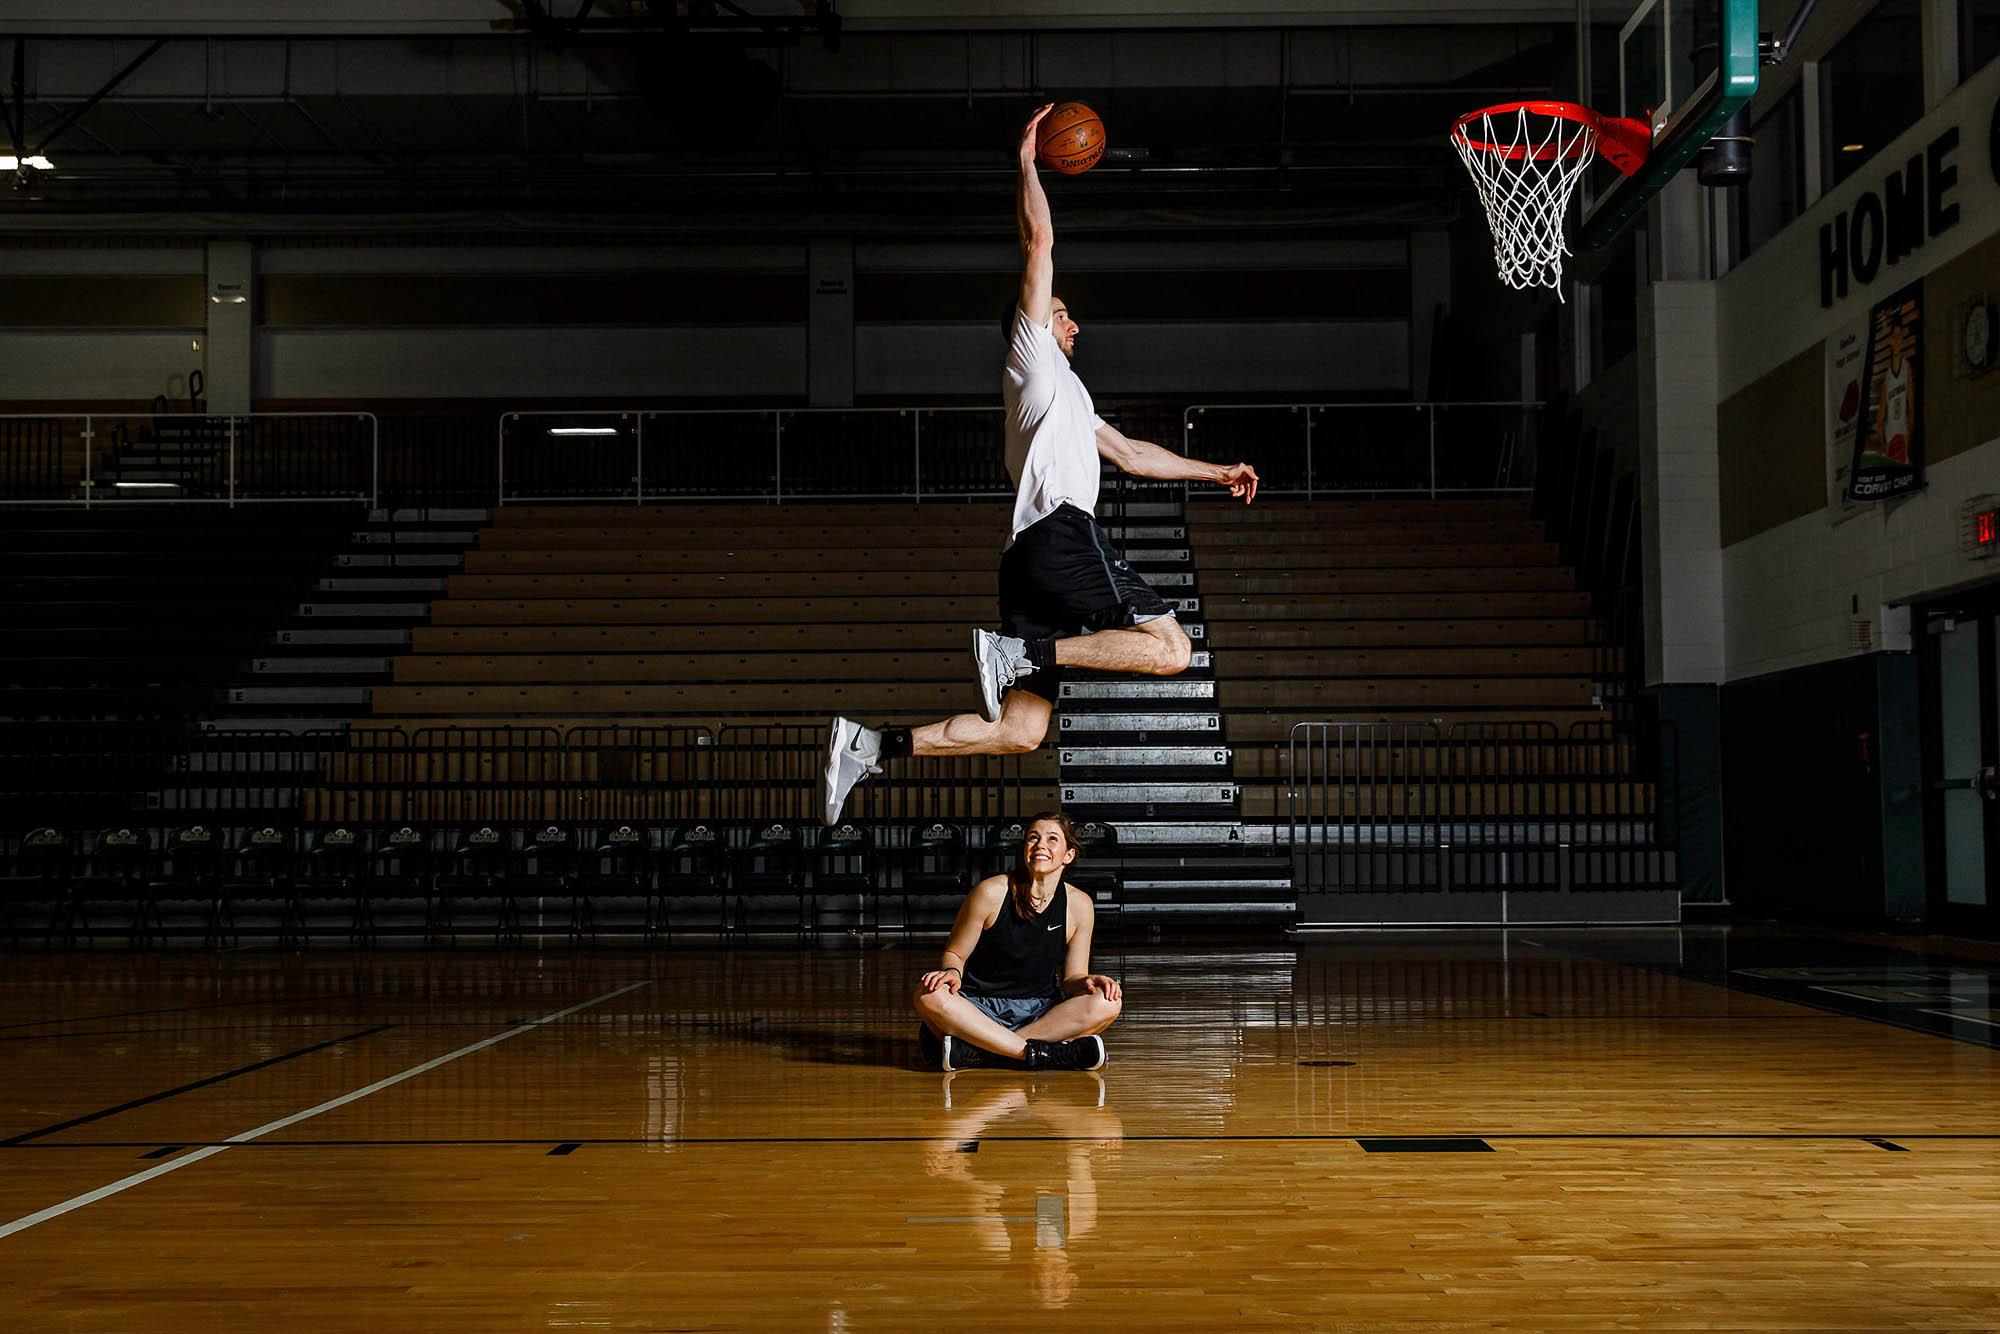 NBA player Kosta Kofus jumps over his fiancée Eline to dunk a basketball.